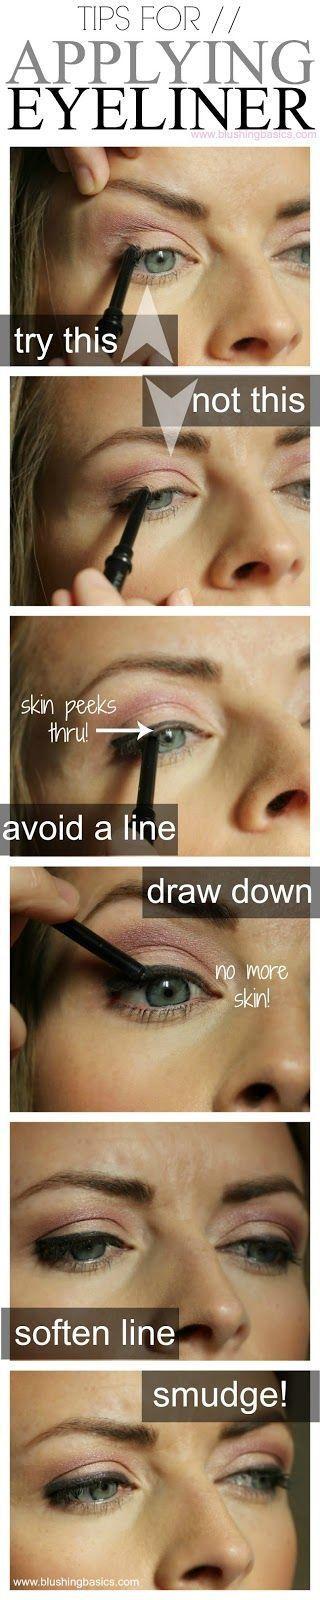 Eyeliner tricks tips hacks: